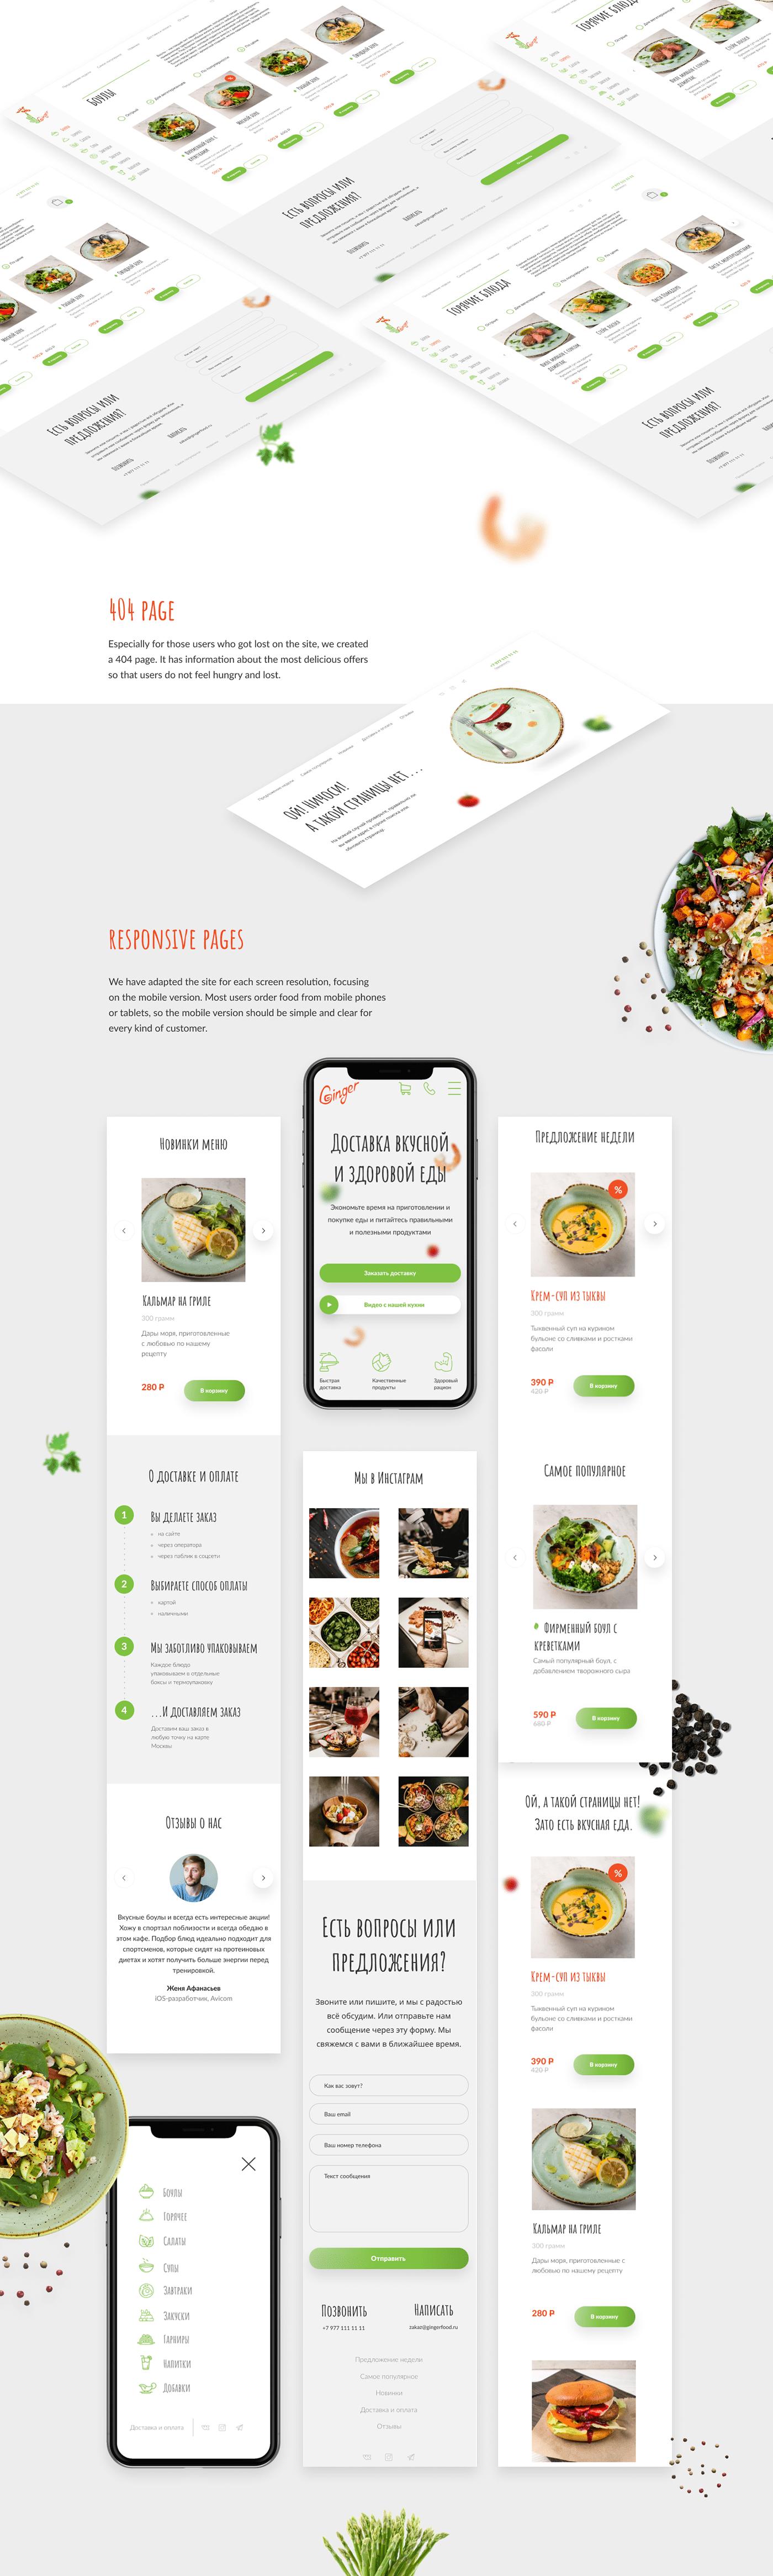 Webdesign uxdesign ux store Food  e-comm shop Website online store